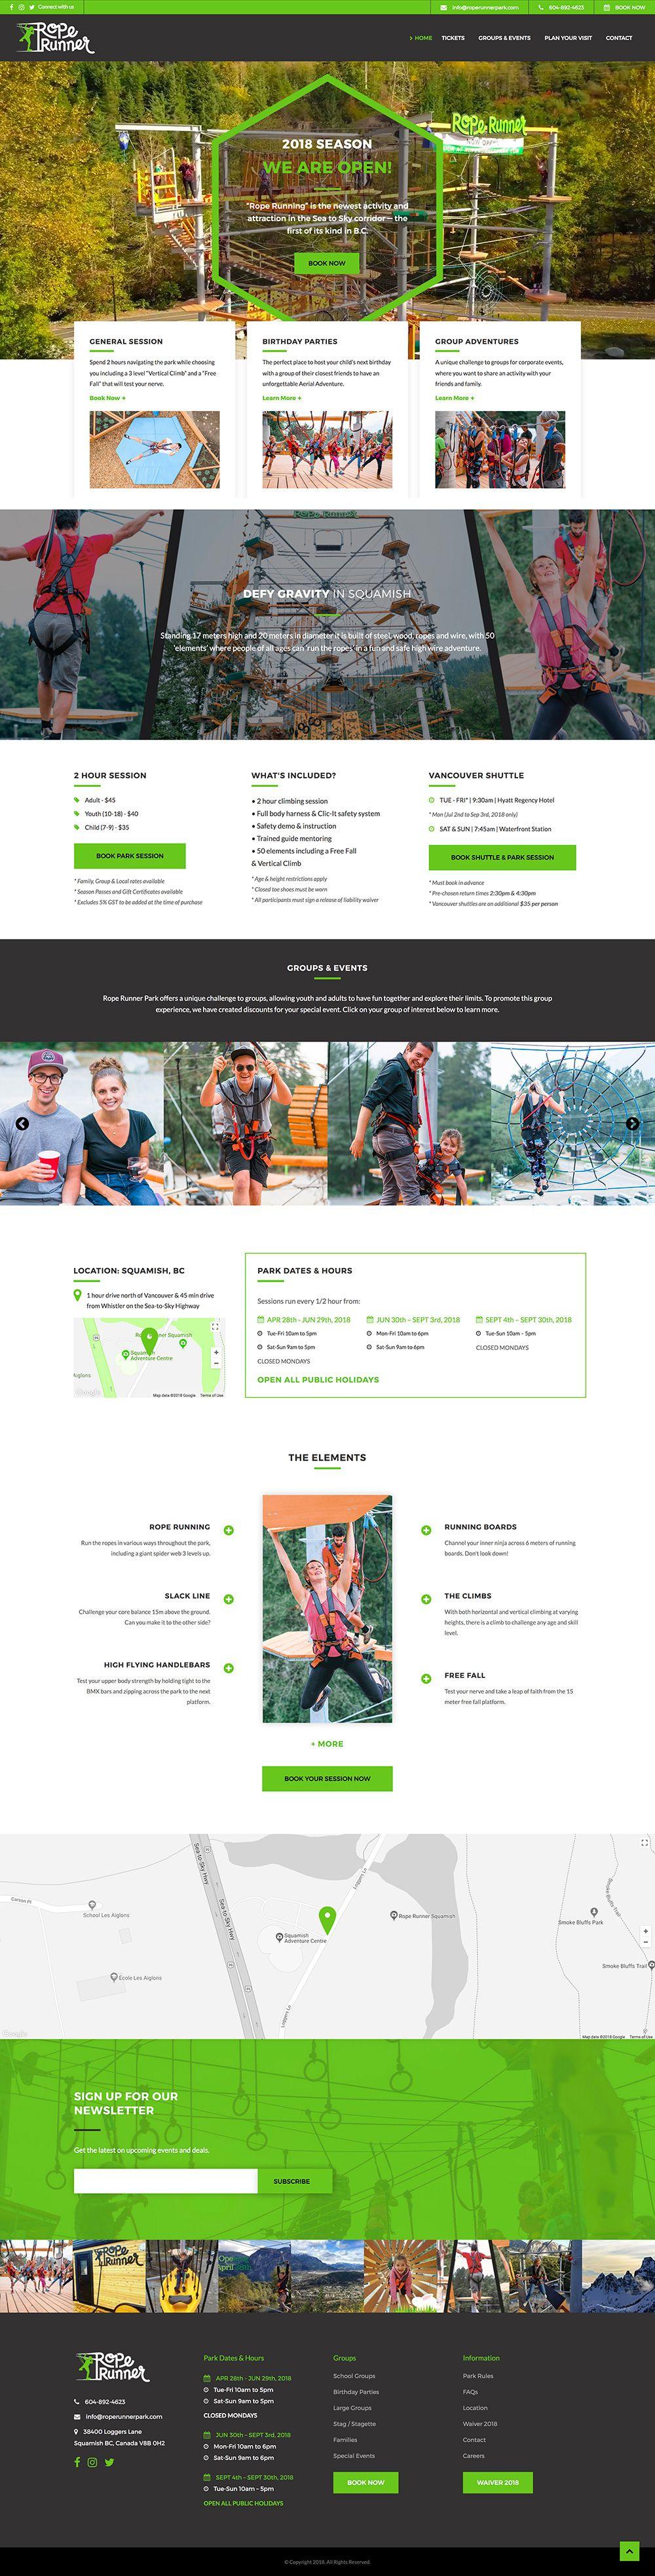 Rope Runner Aerial Adventure Park Lindsay Mcghee Designs Website Design Squamish Bc In 2020 Adventure Park Extreme Adventure Tradeshow Banner